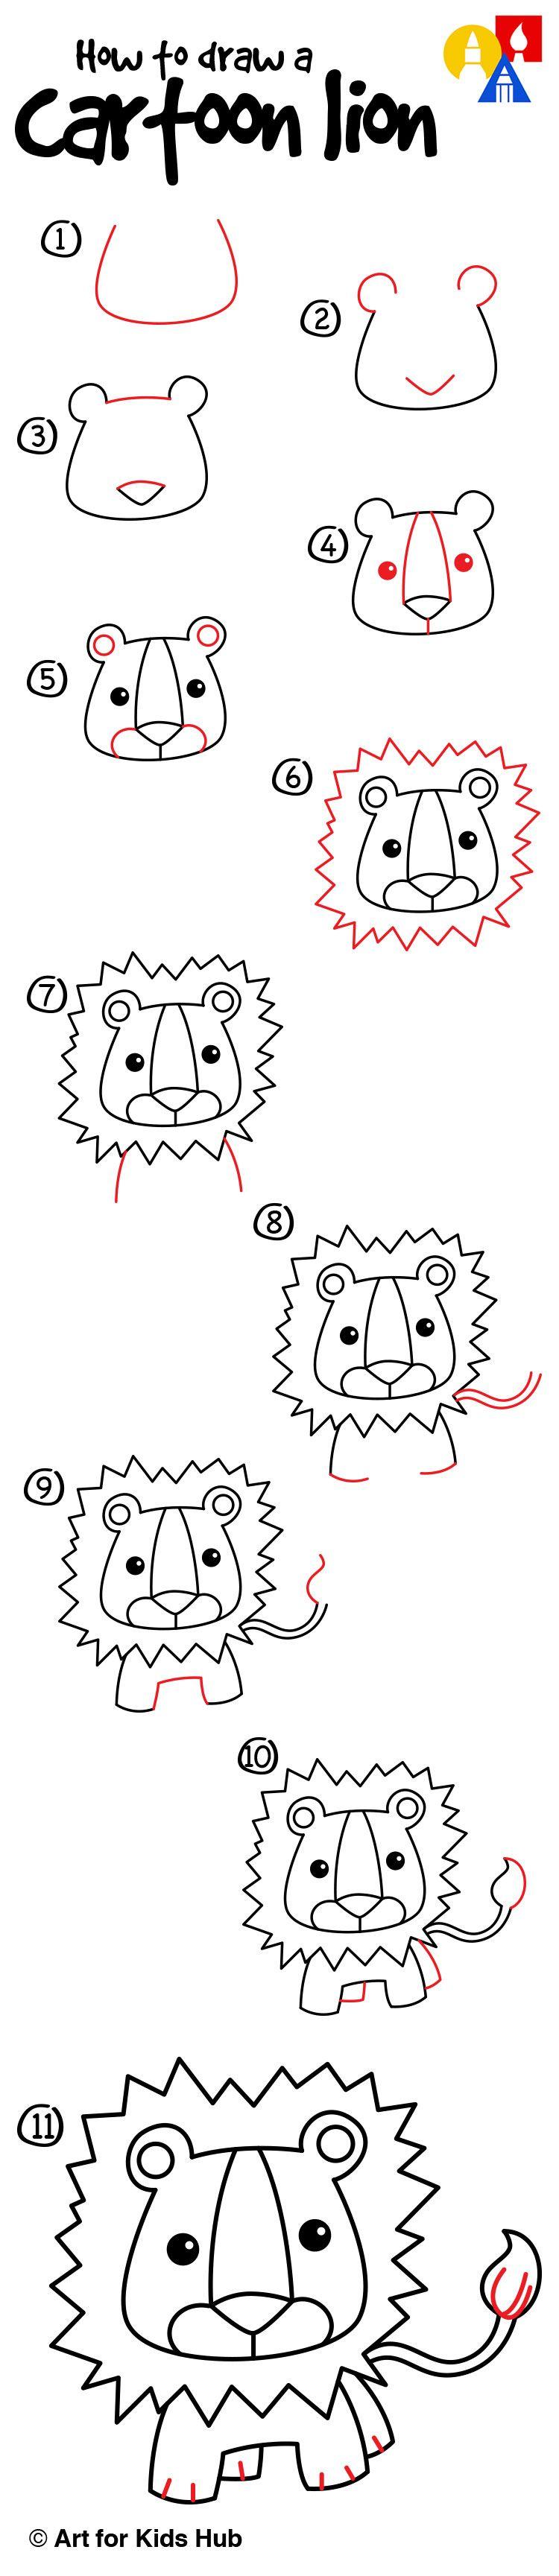 How To Draw A Cartoon Lion Art For Kids Hub Cartoon Lion